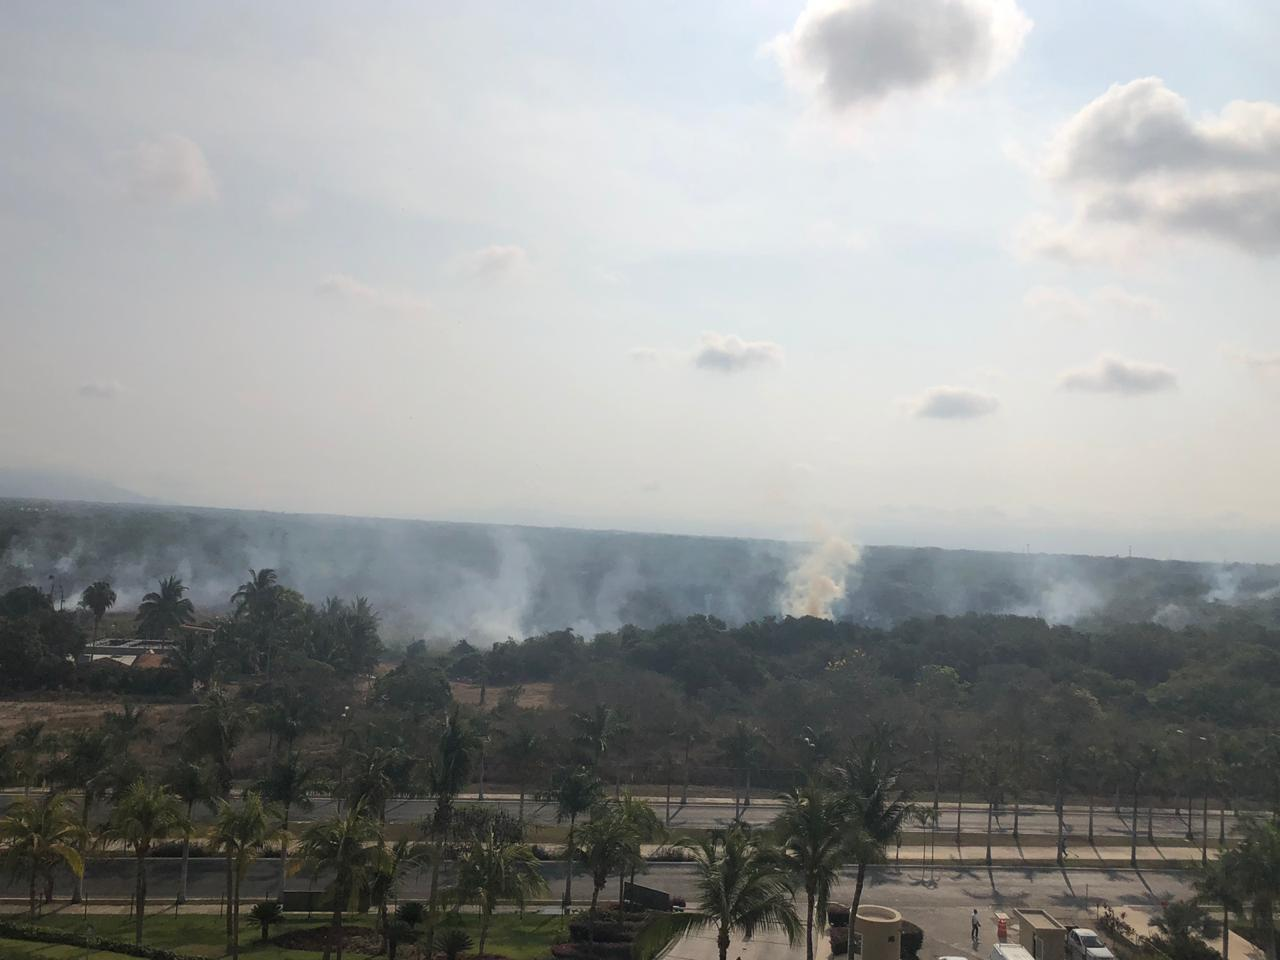 En zona de mangle: Desarrolladores incendian maleza (Nayarit)